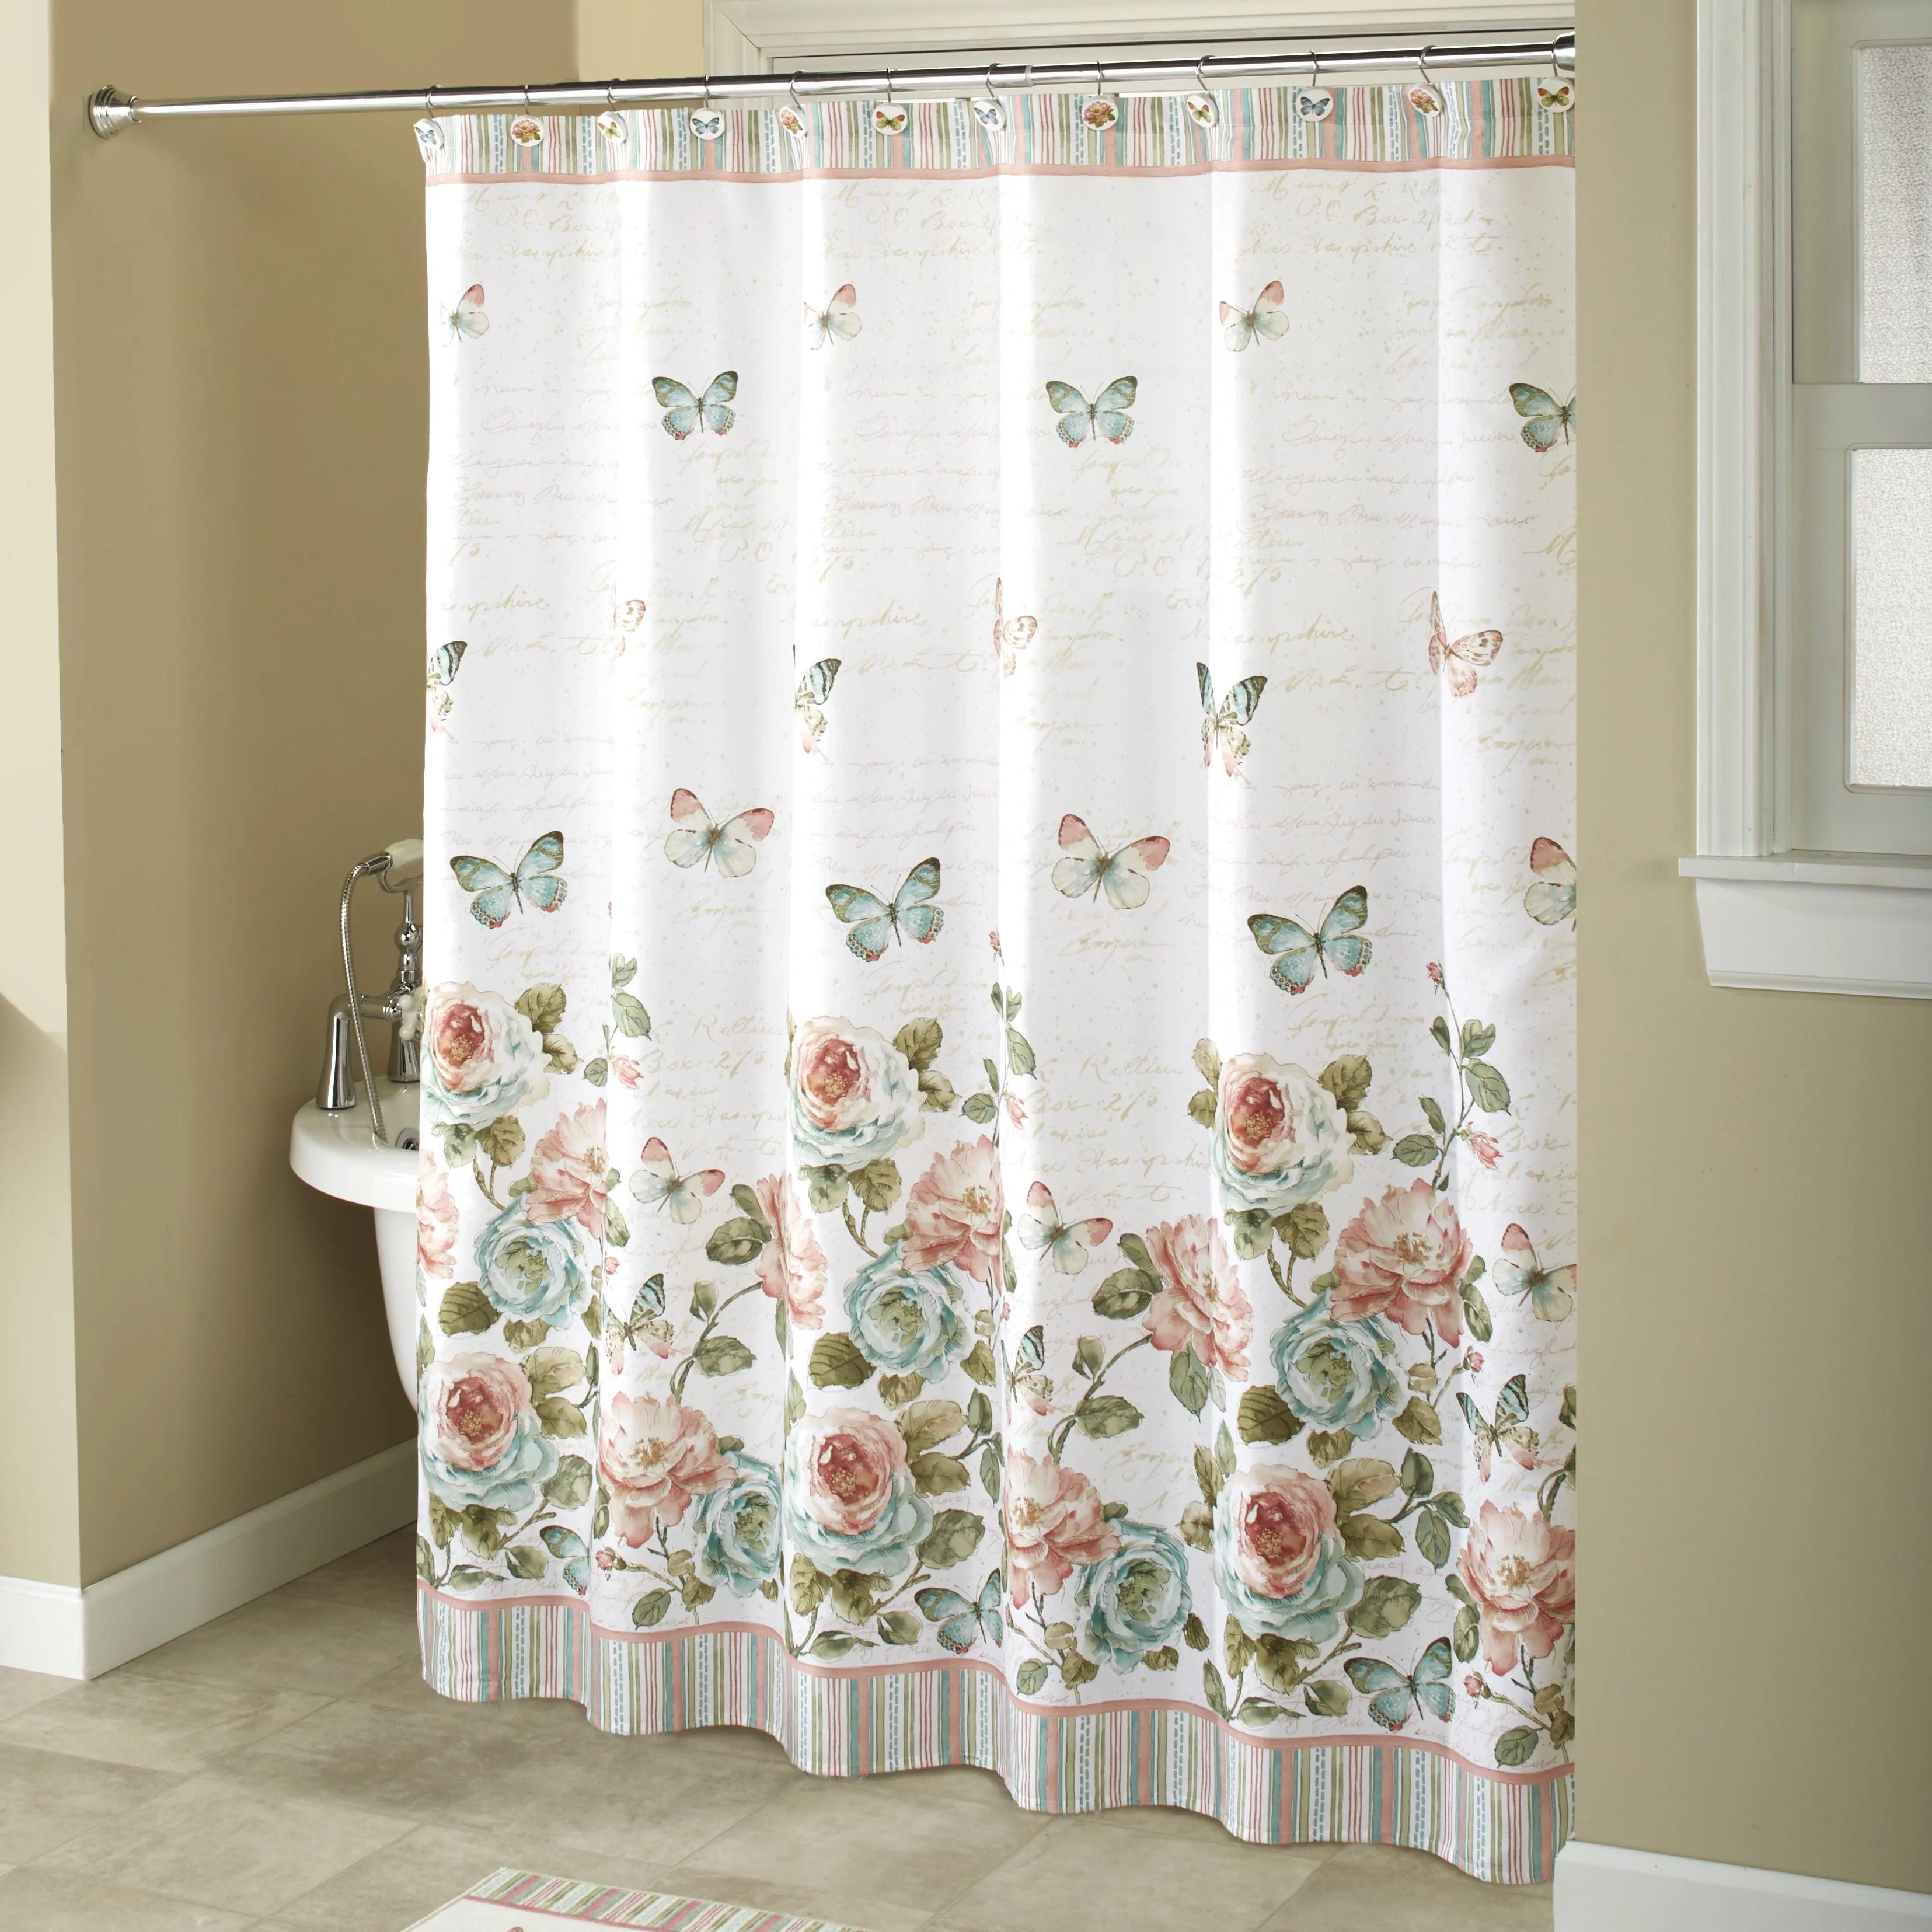 rose garden white shower curtain farmhouse floral accent